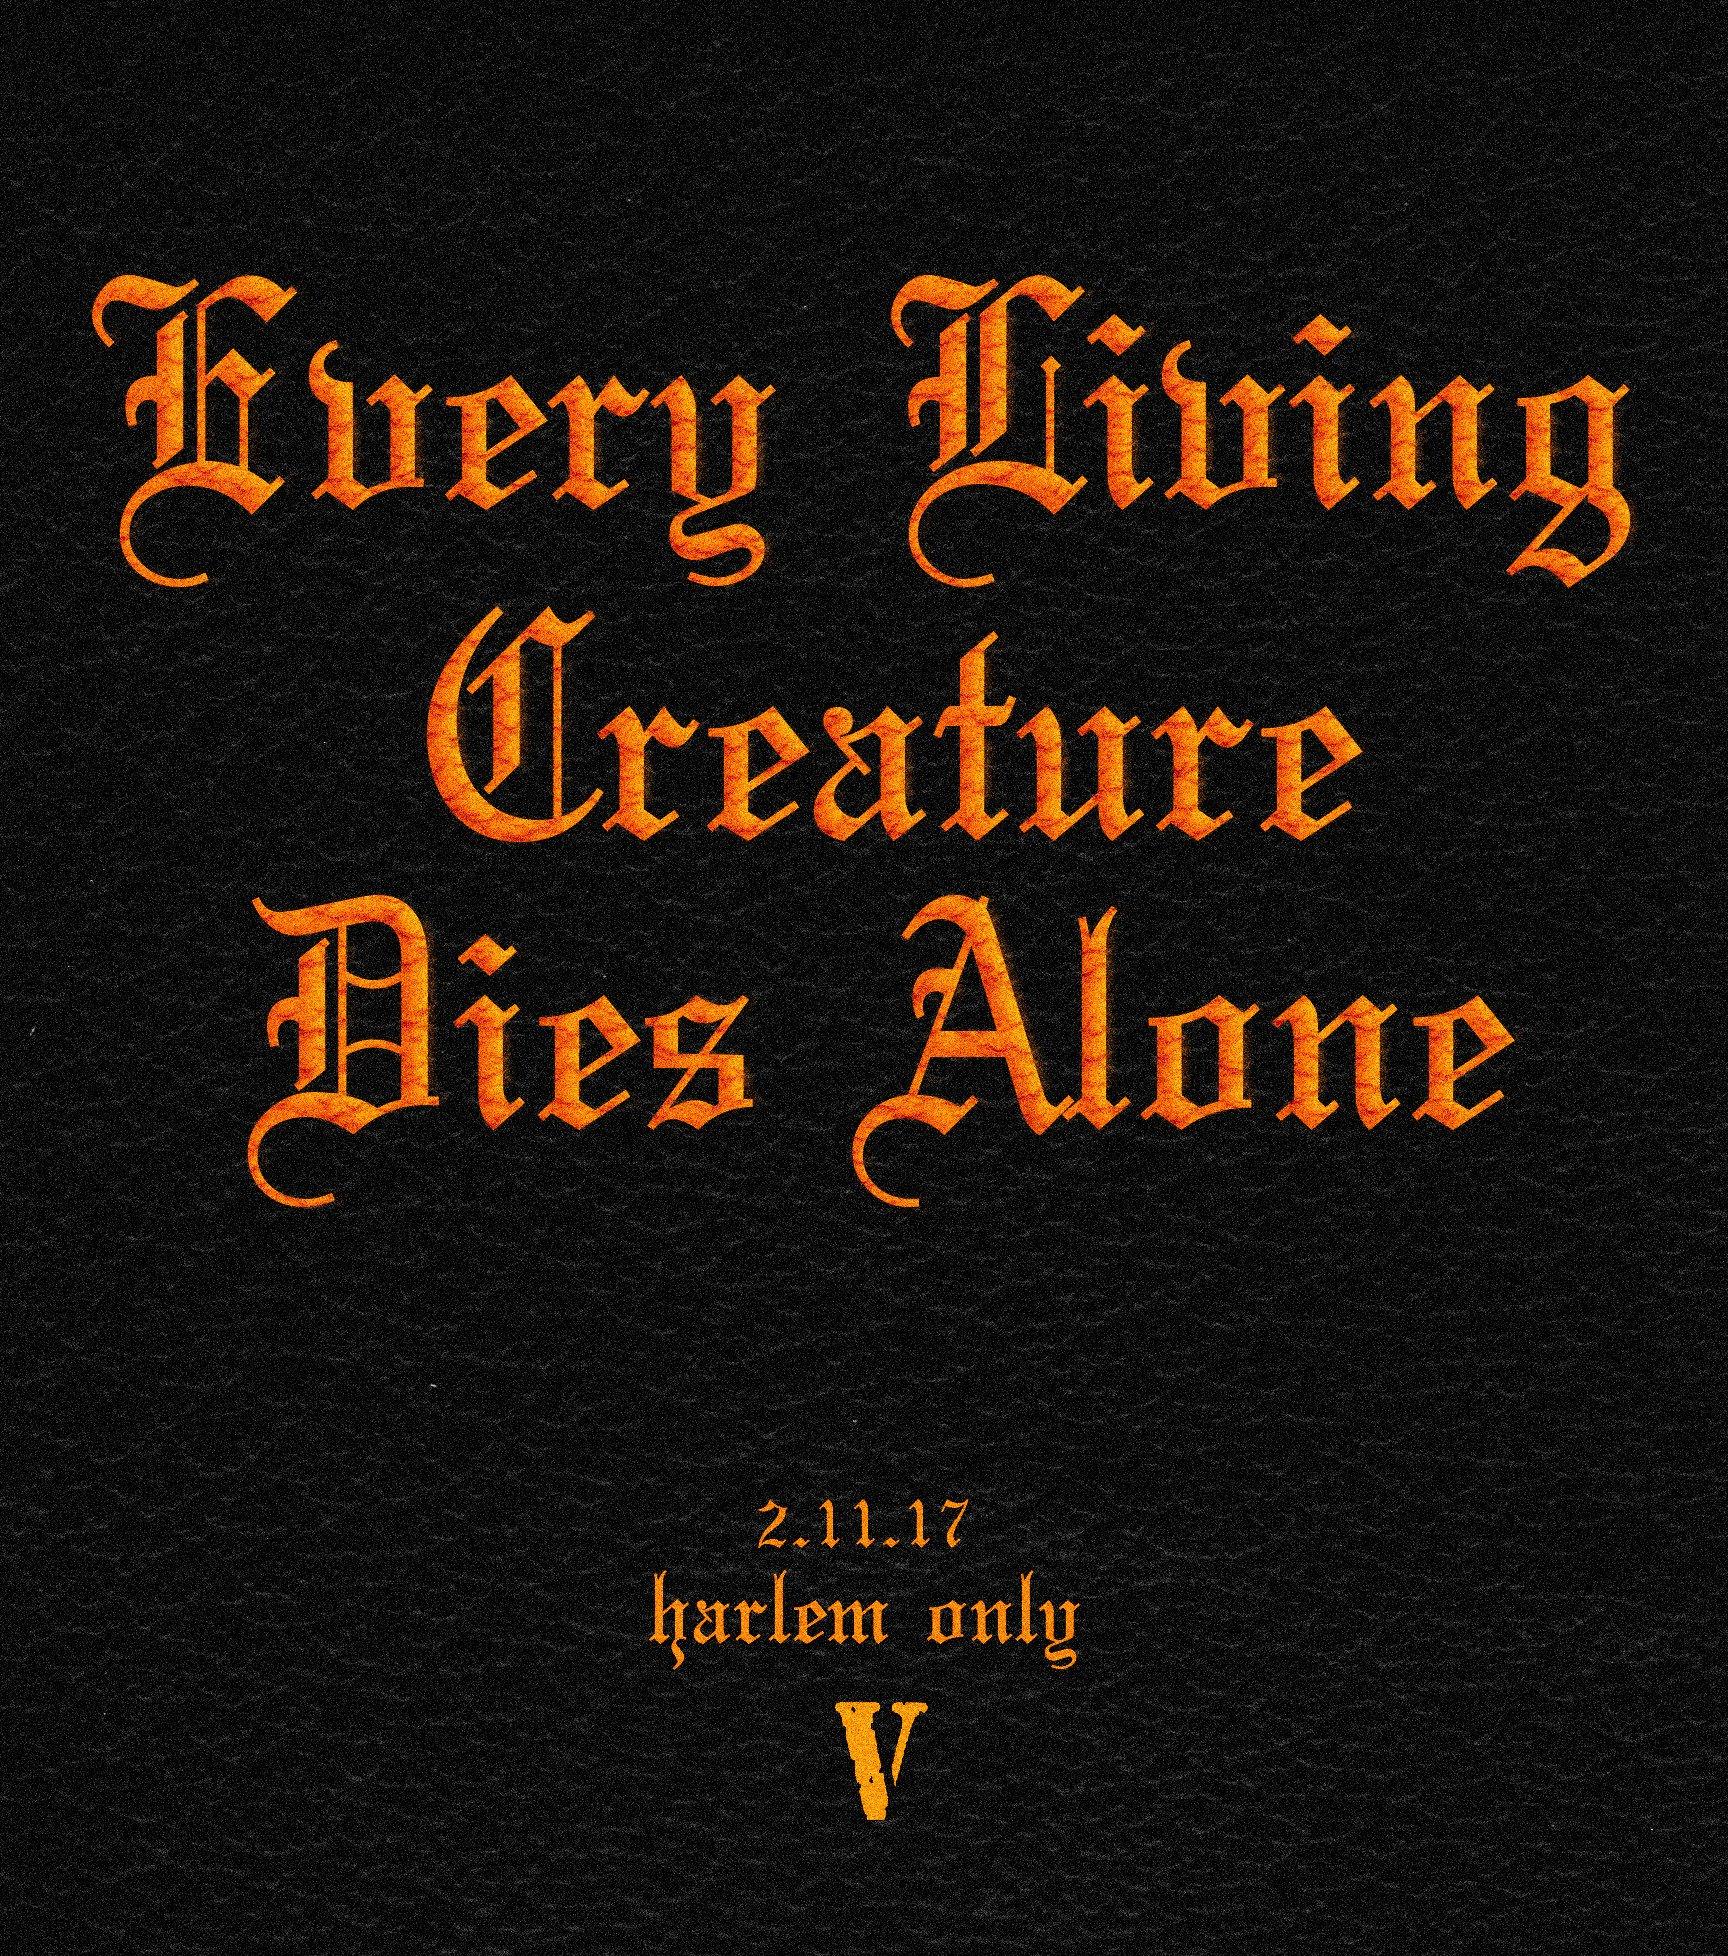 "Sloth x Sean on Twitter: ""2.11.17 'Every Living Creature Dies Alone' • HARLEM ONLY• //.VLONE X NIKE @TOASTOTHEGOD @VLONE @nikestore… """